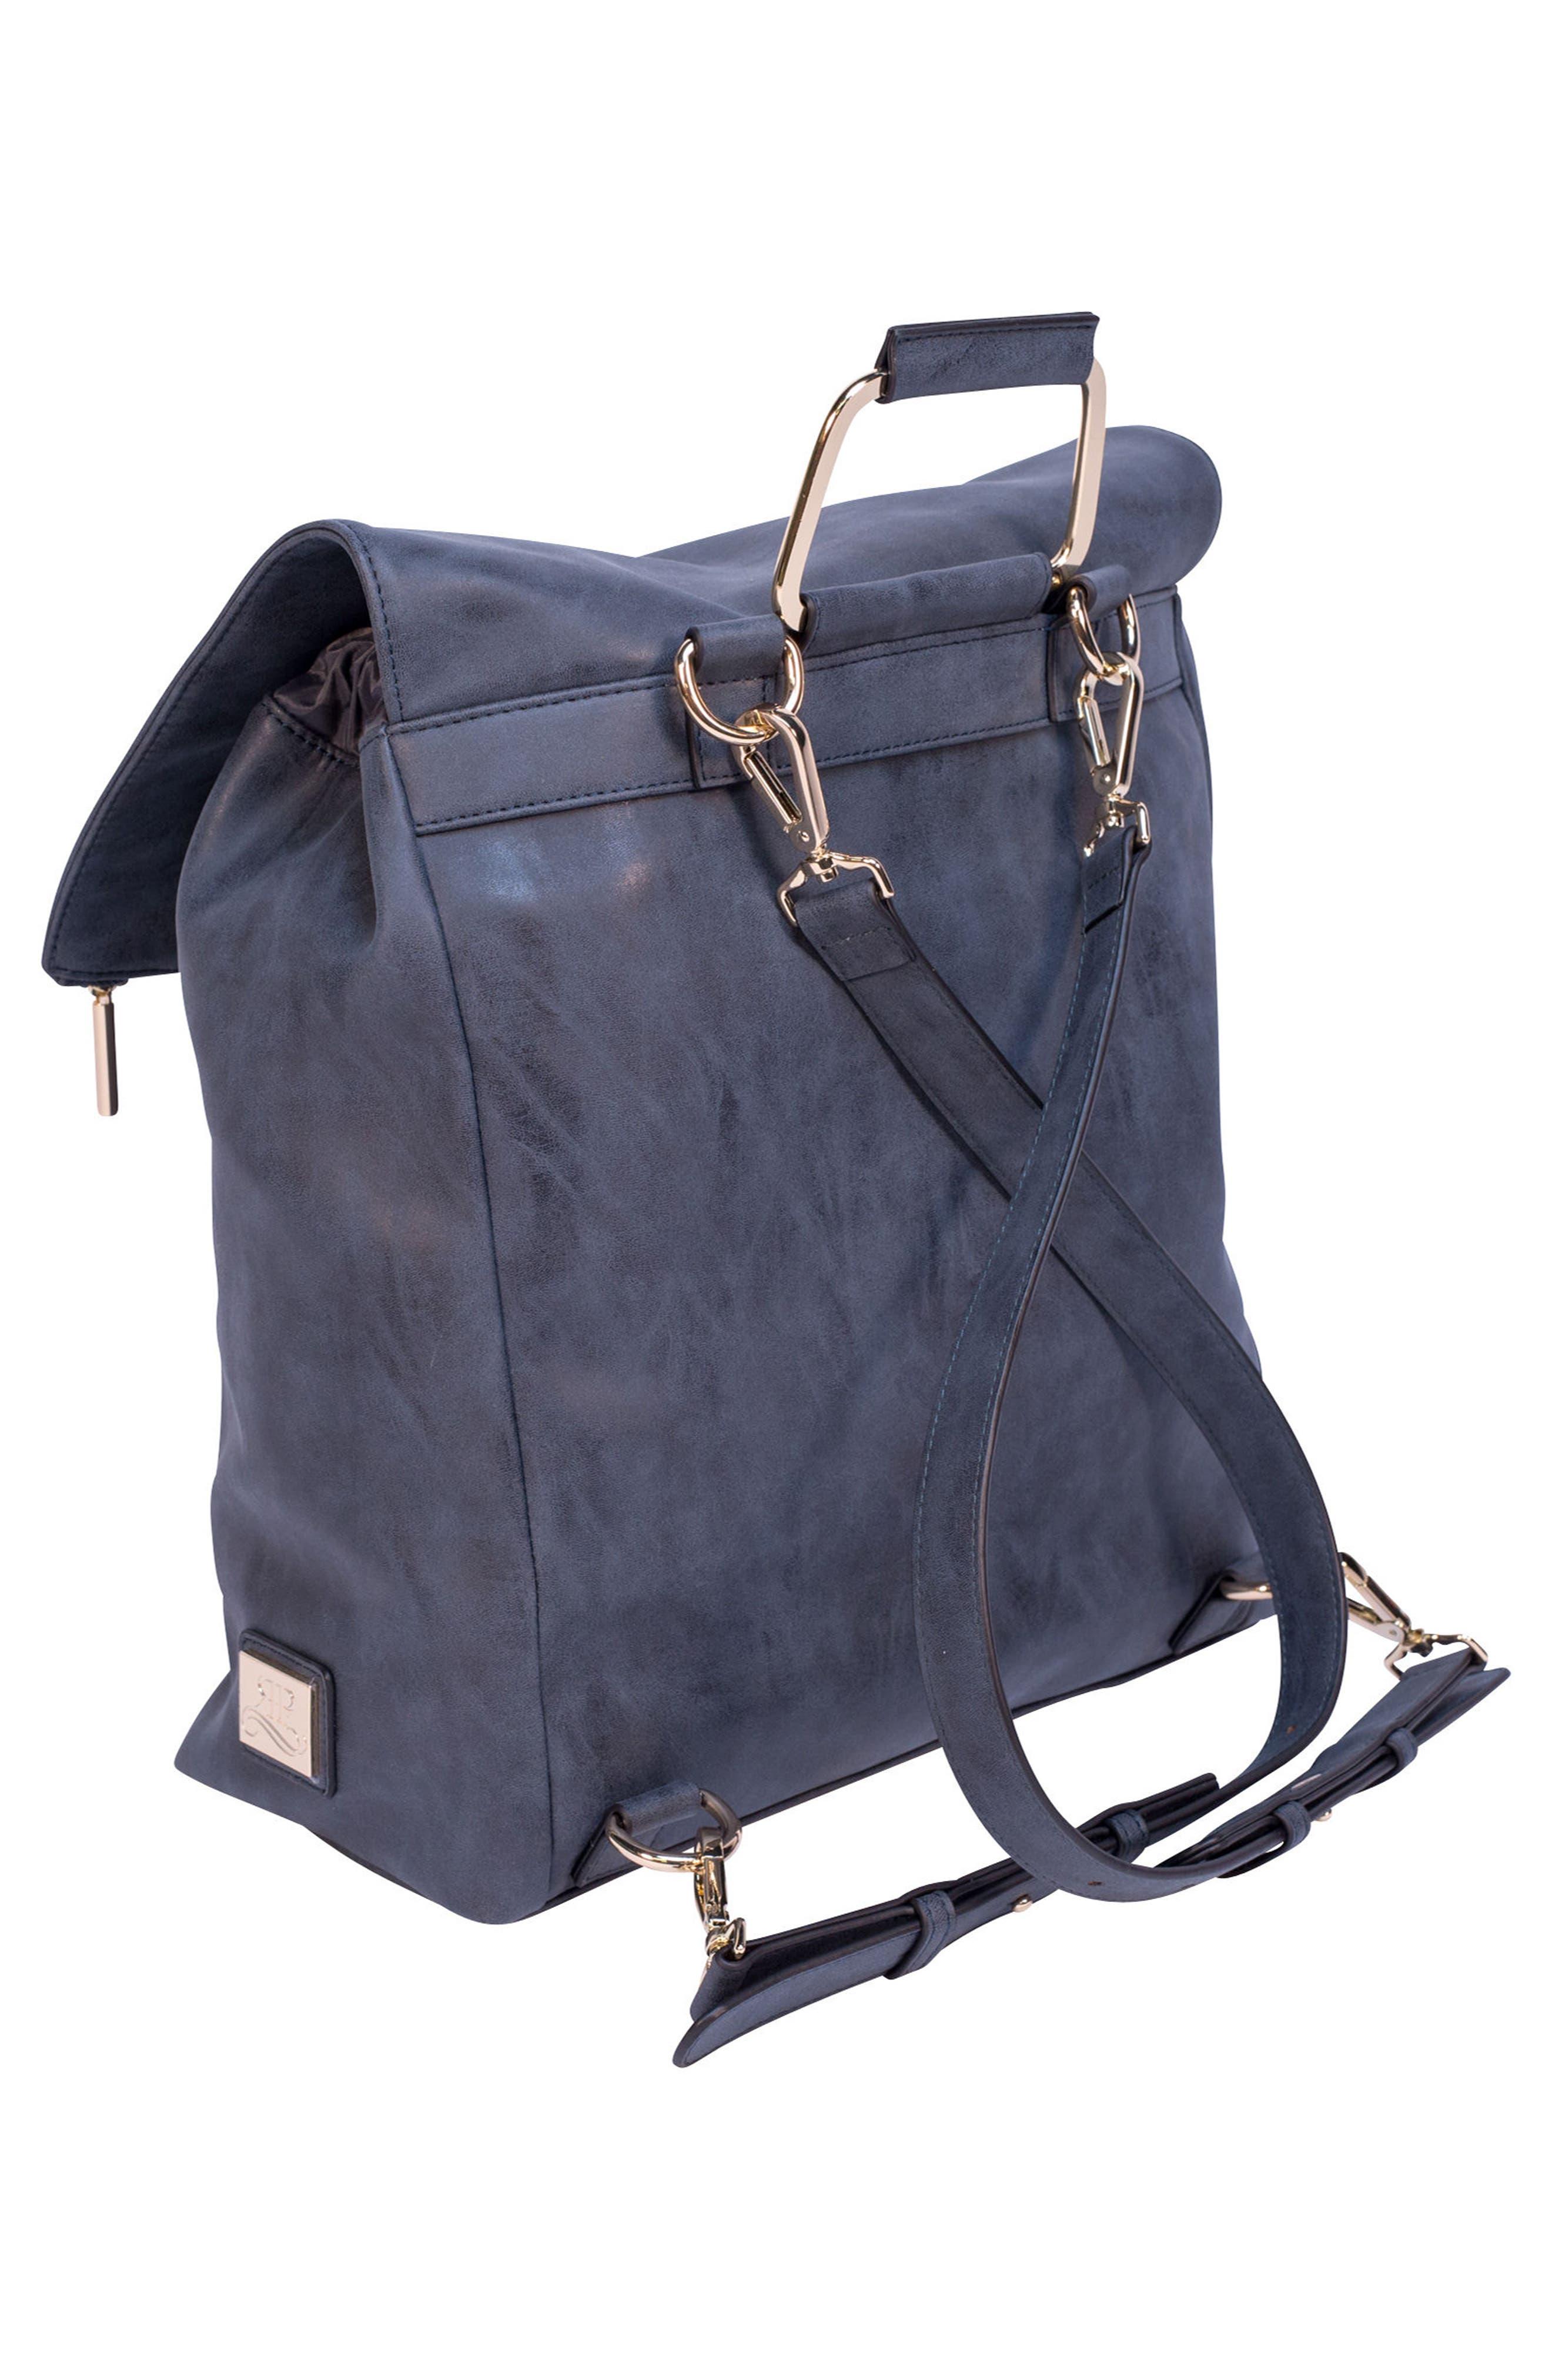 ROSIE POPE, Highbury Hill Diaper Backpack, Alternate thumbnail 3, color, DUSTY NAVY